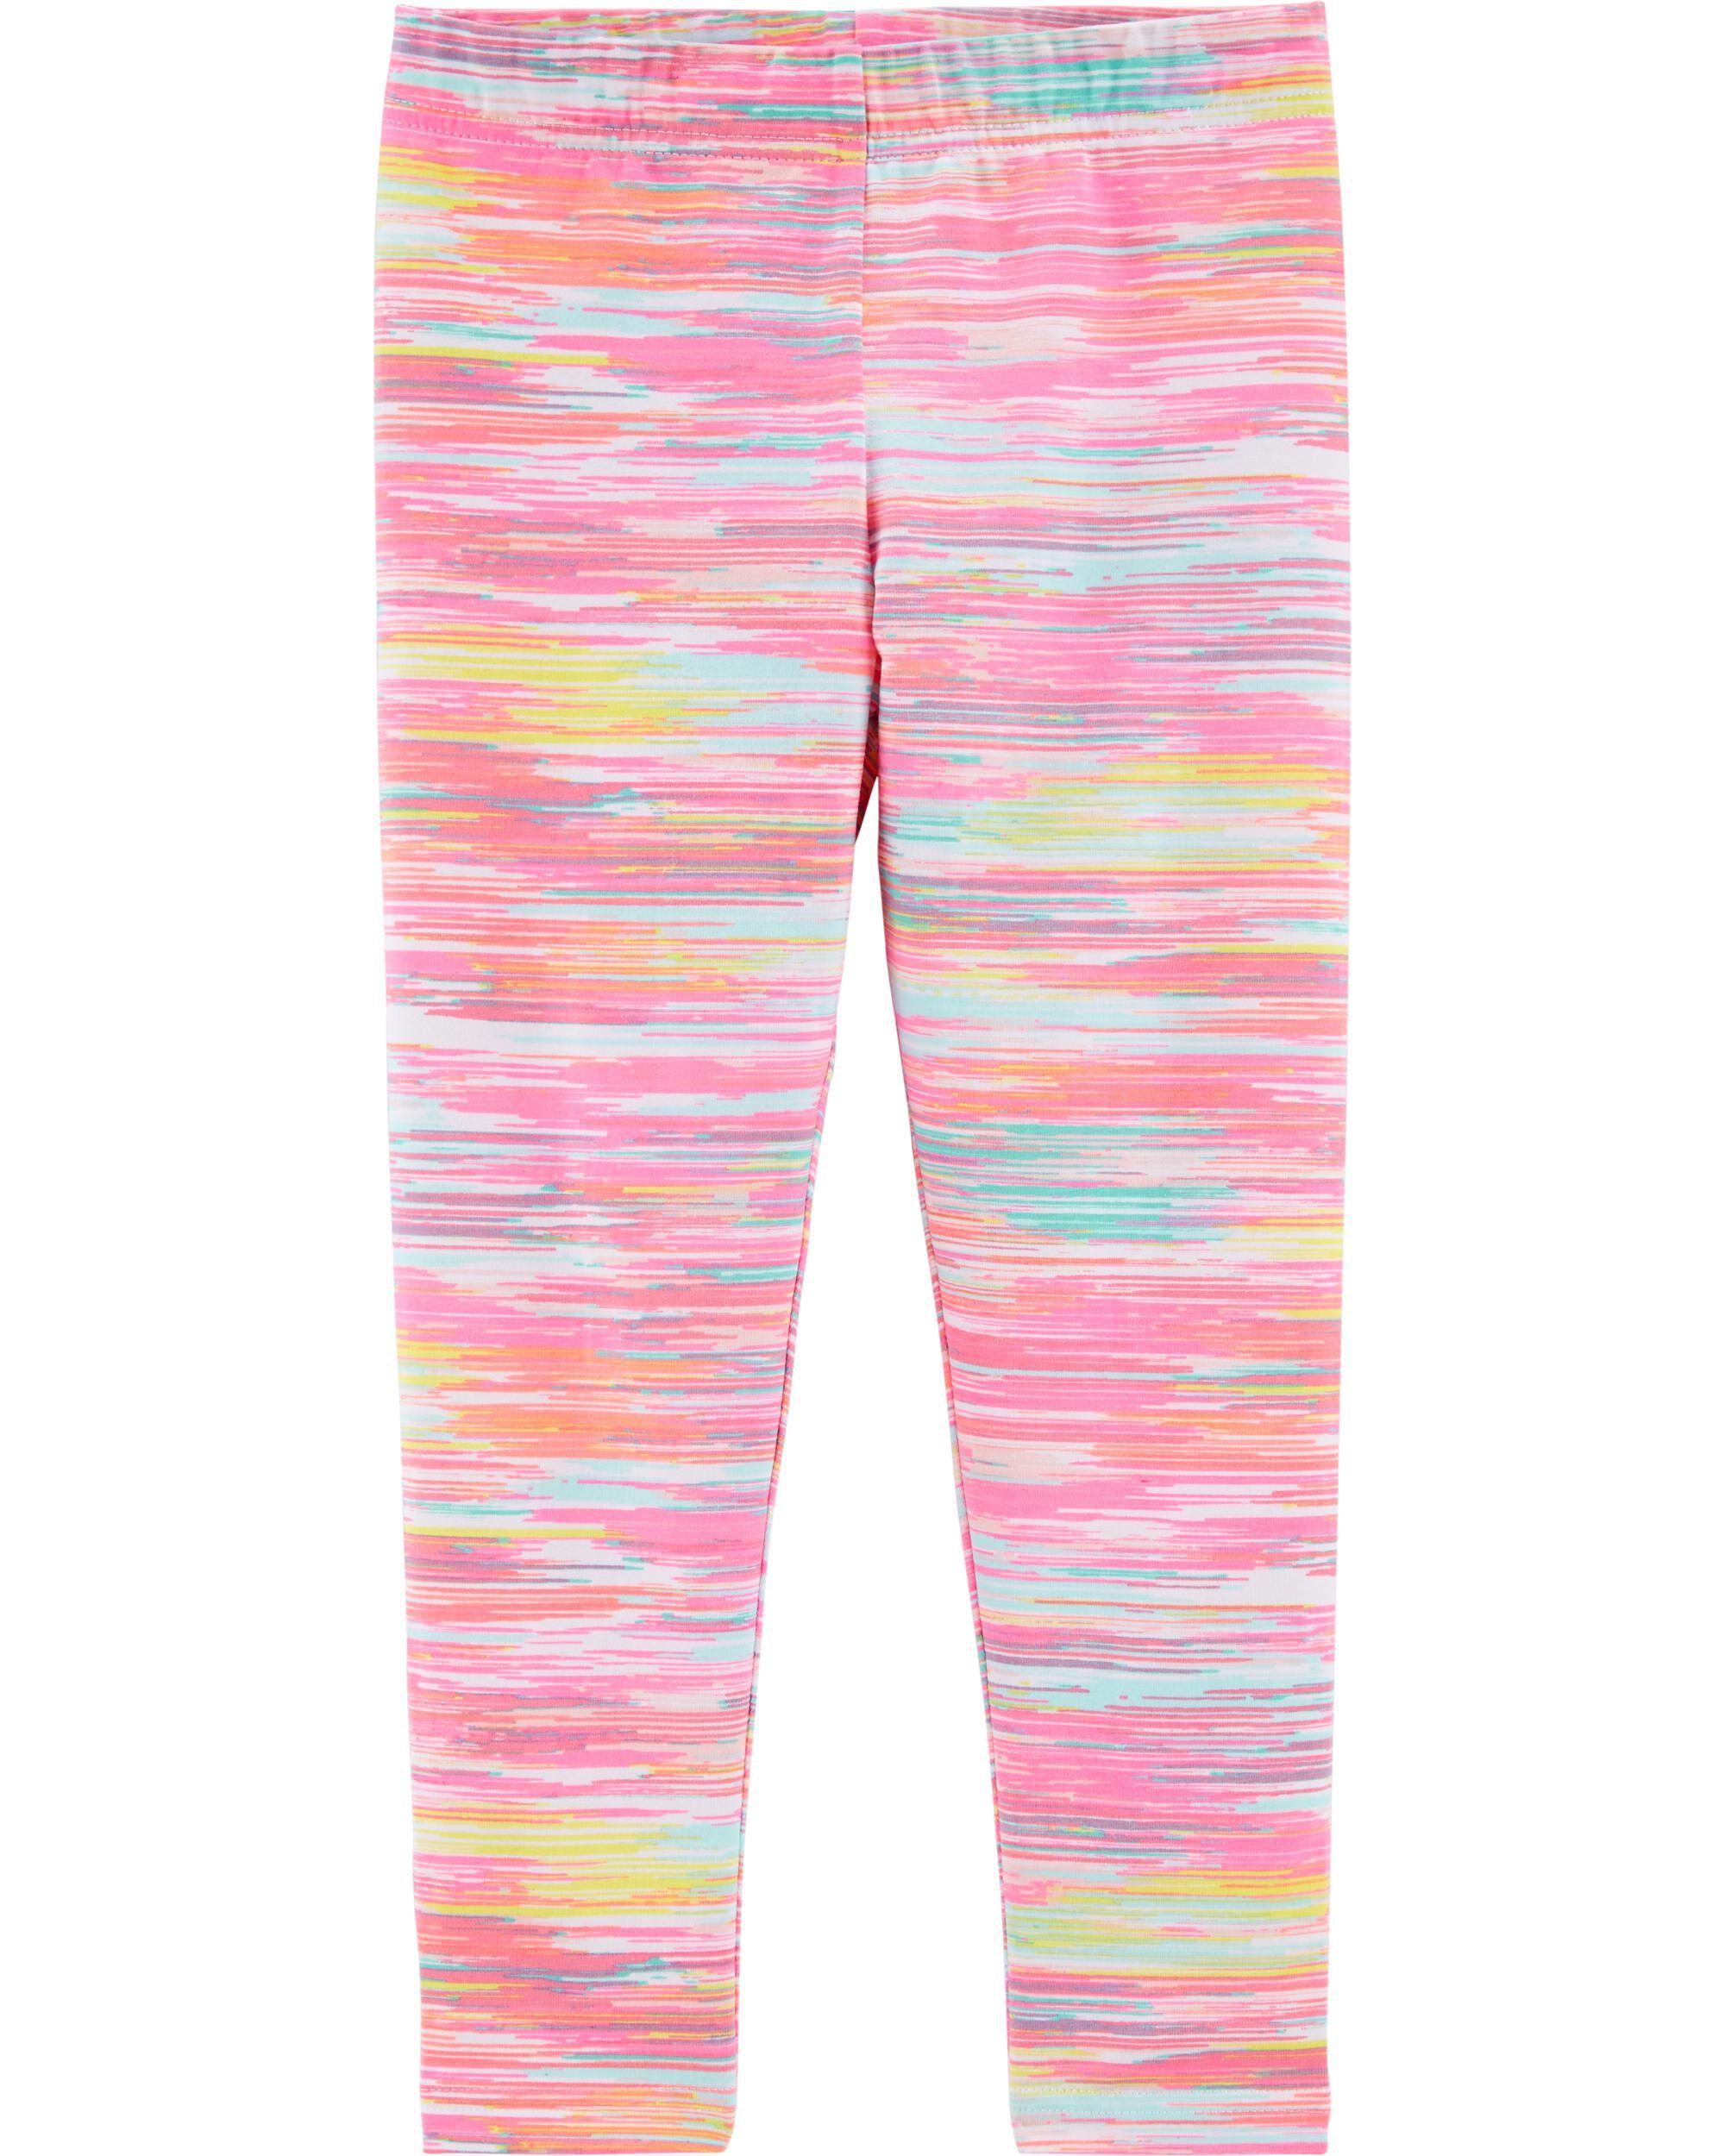 NWT $18-Girls Carters Brown Floral Leggings Elastic Waist Casual Pants-size 4